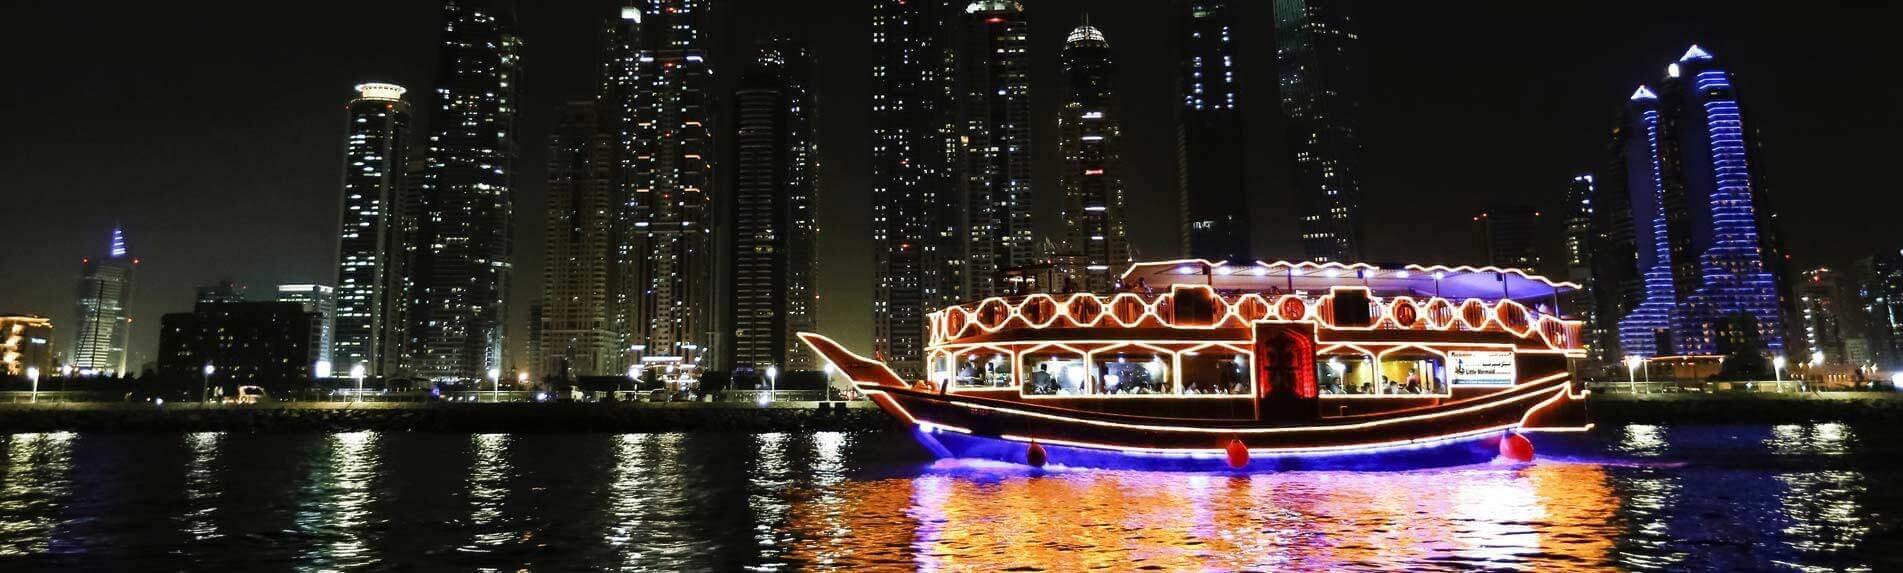 Dhow Cruise Dinner - Marina - Tour